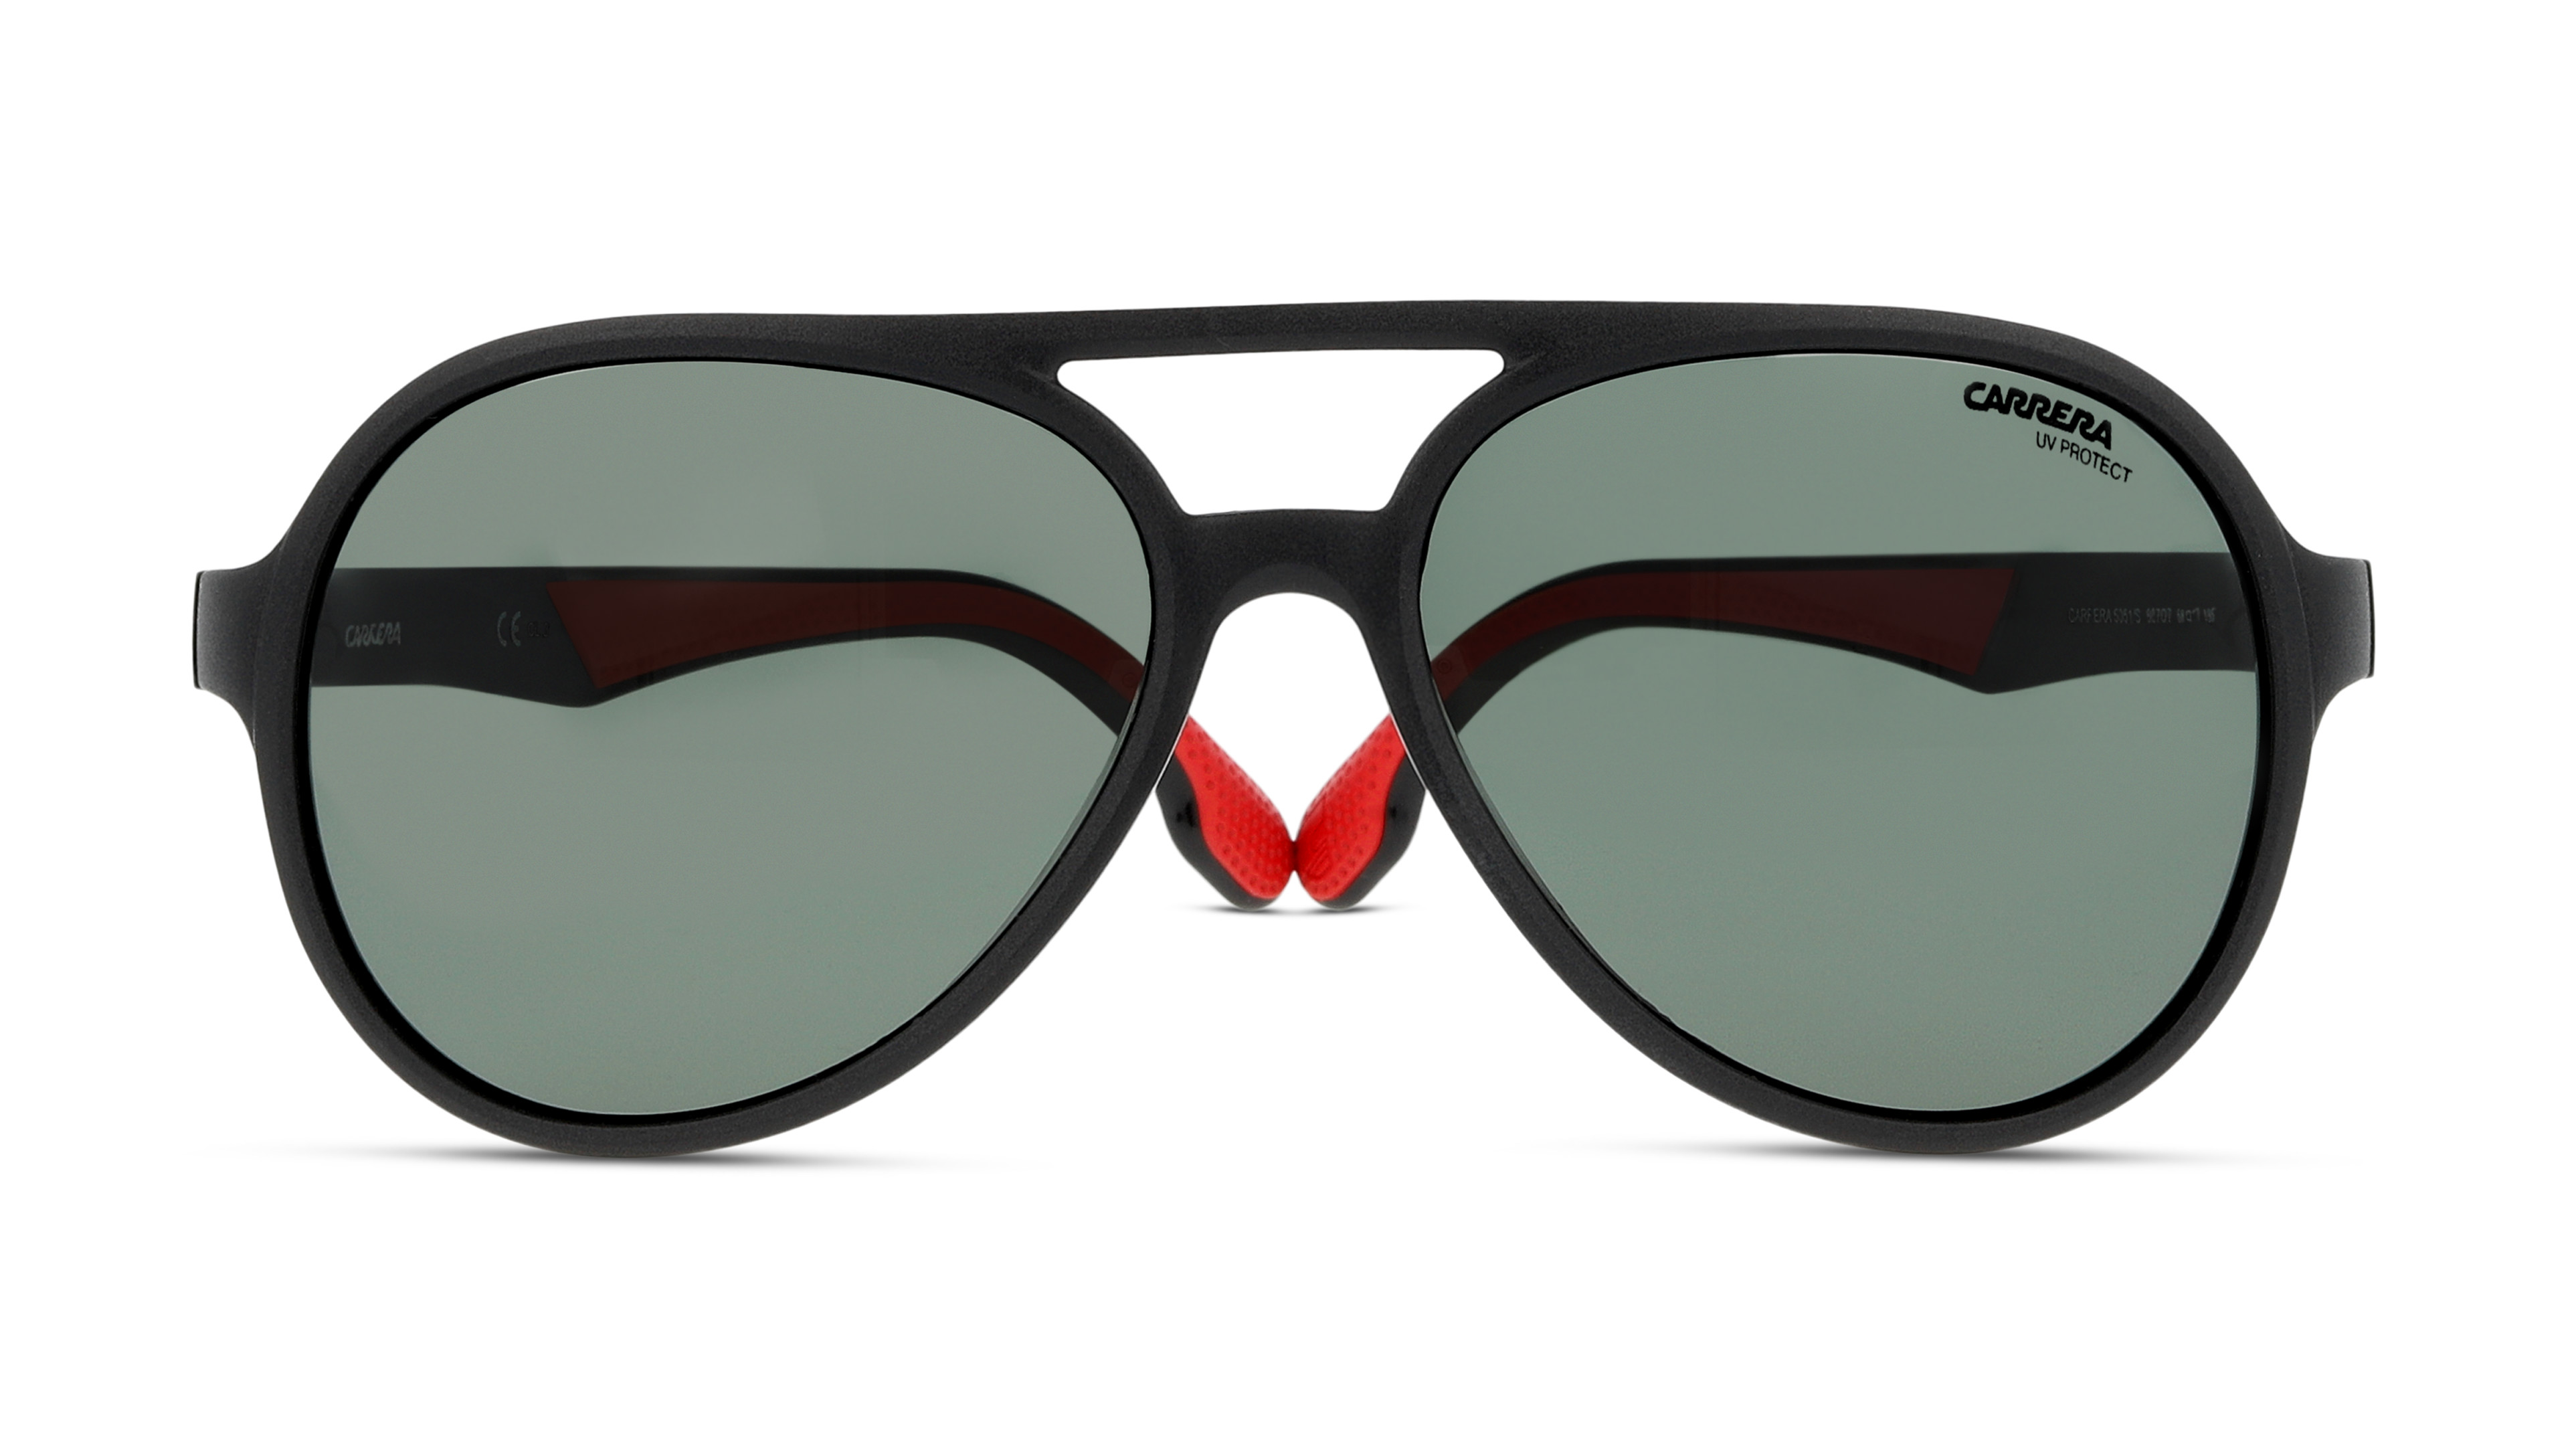 716736193137-front-01-carrera-carrera-5051-s-eyewear-black